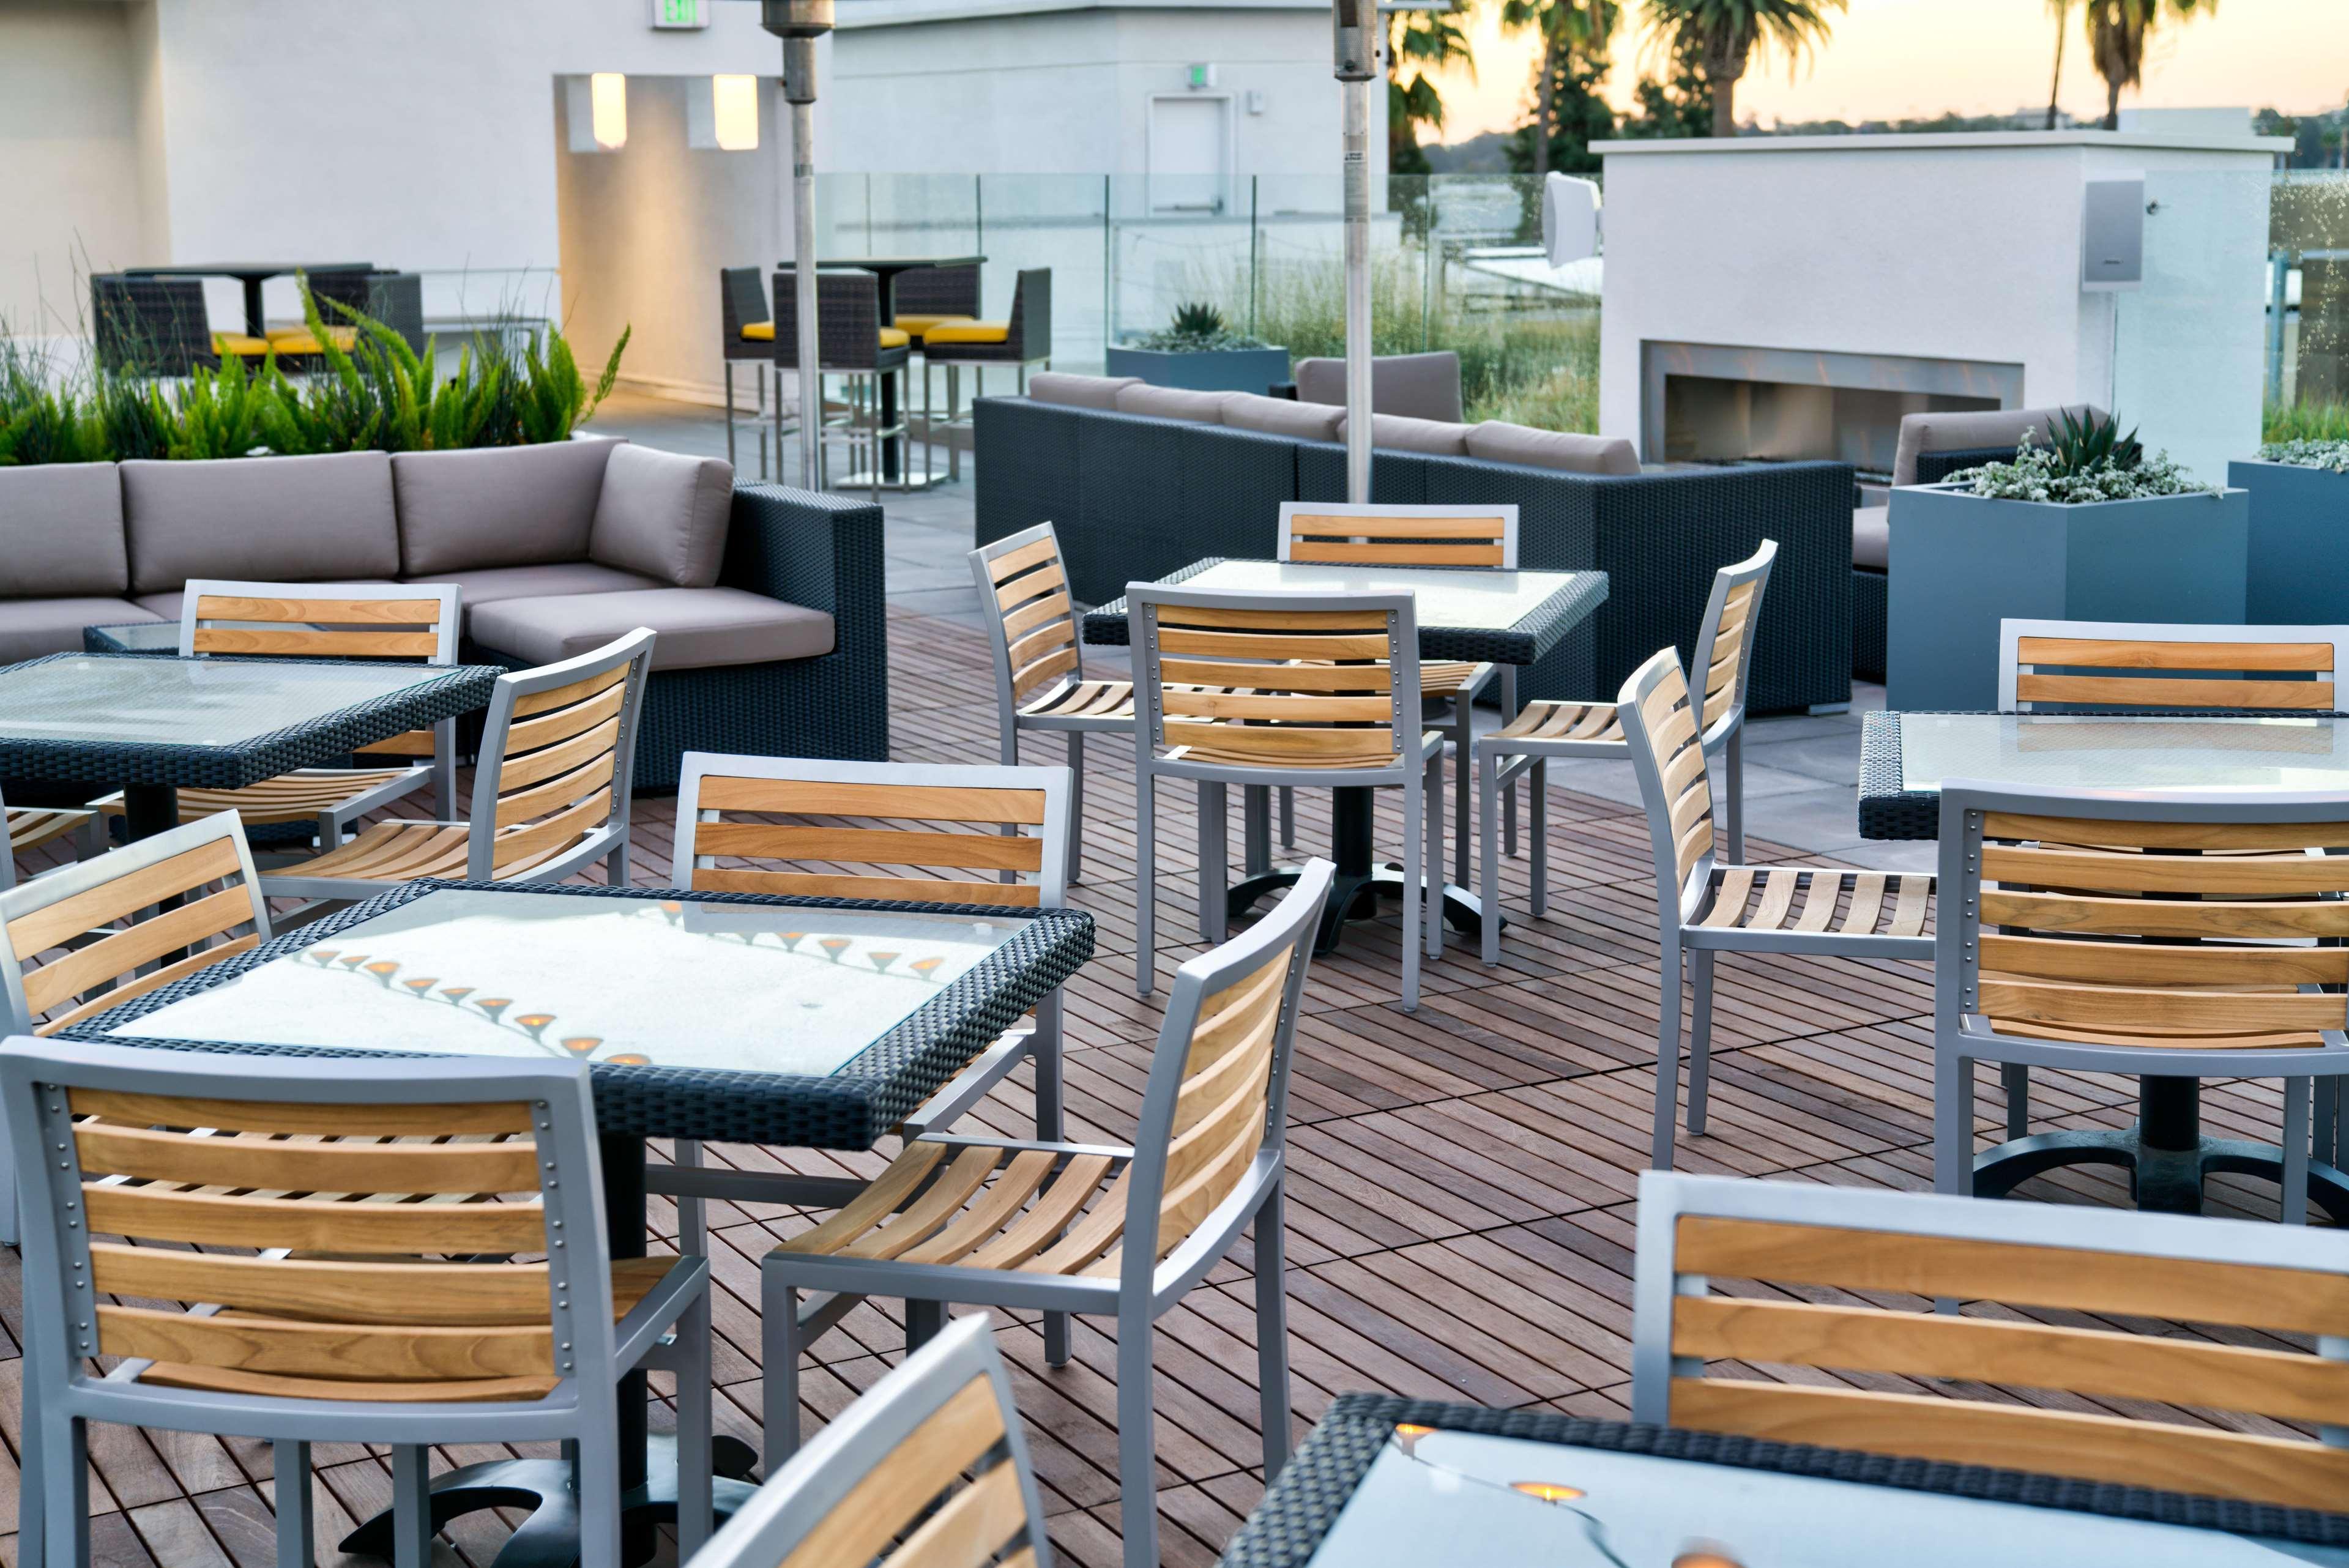 Hilton Garden Inn Santa Barbara/Goleta image 7